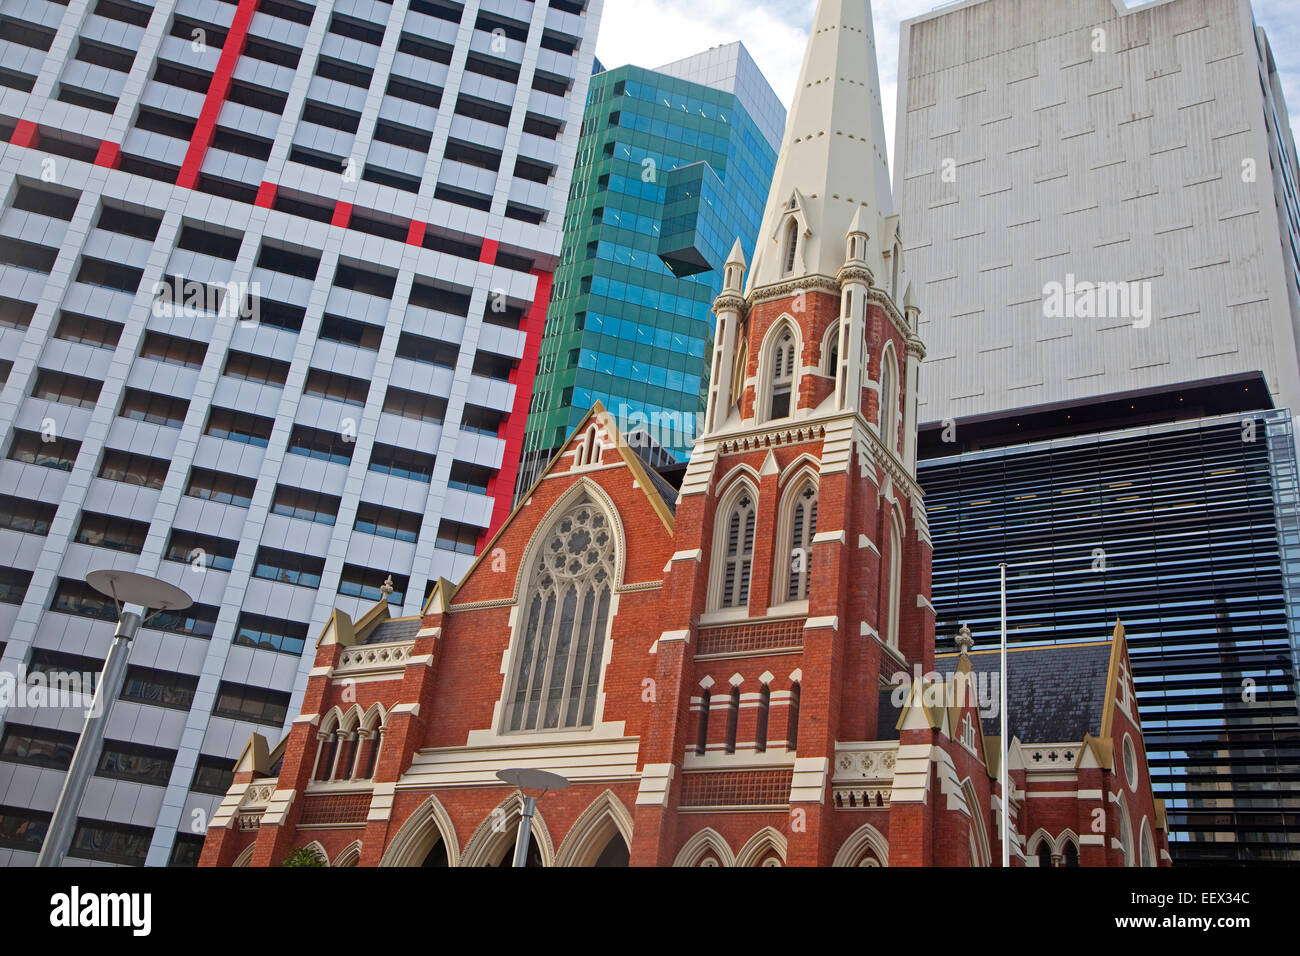 Albert Street Uniting Church, former Methodist Wesleyan Chapel in the center of Brisbane, capital city of Queensland, - Stock Image